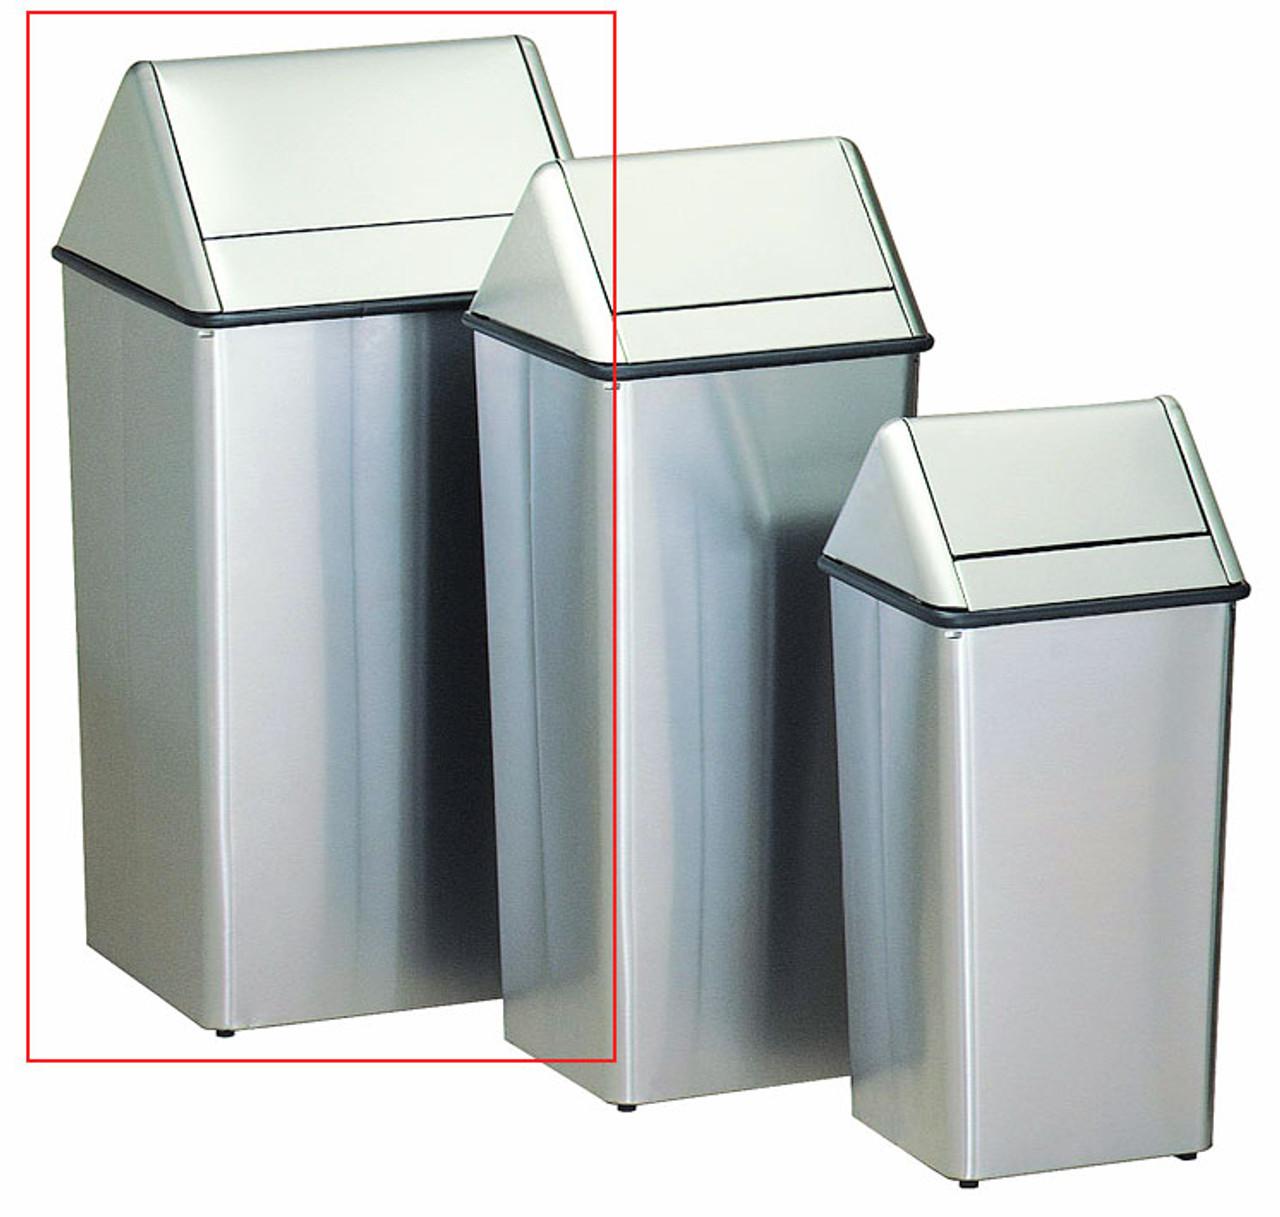 Metal Stainless Steel 36 Gallon Swing Top Waste Receptacle 1511HTSS